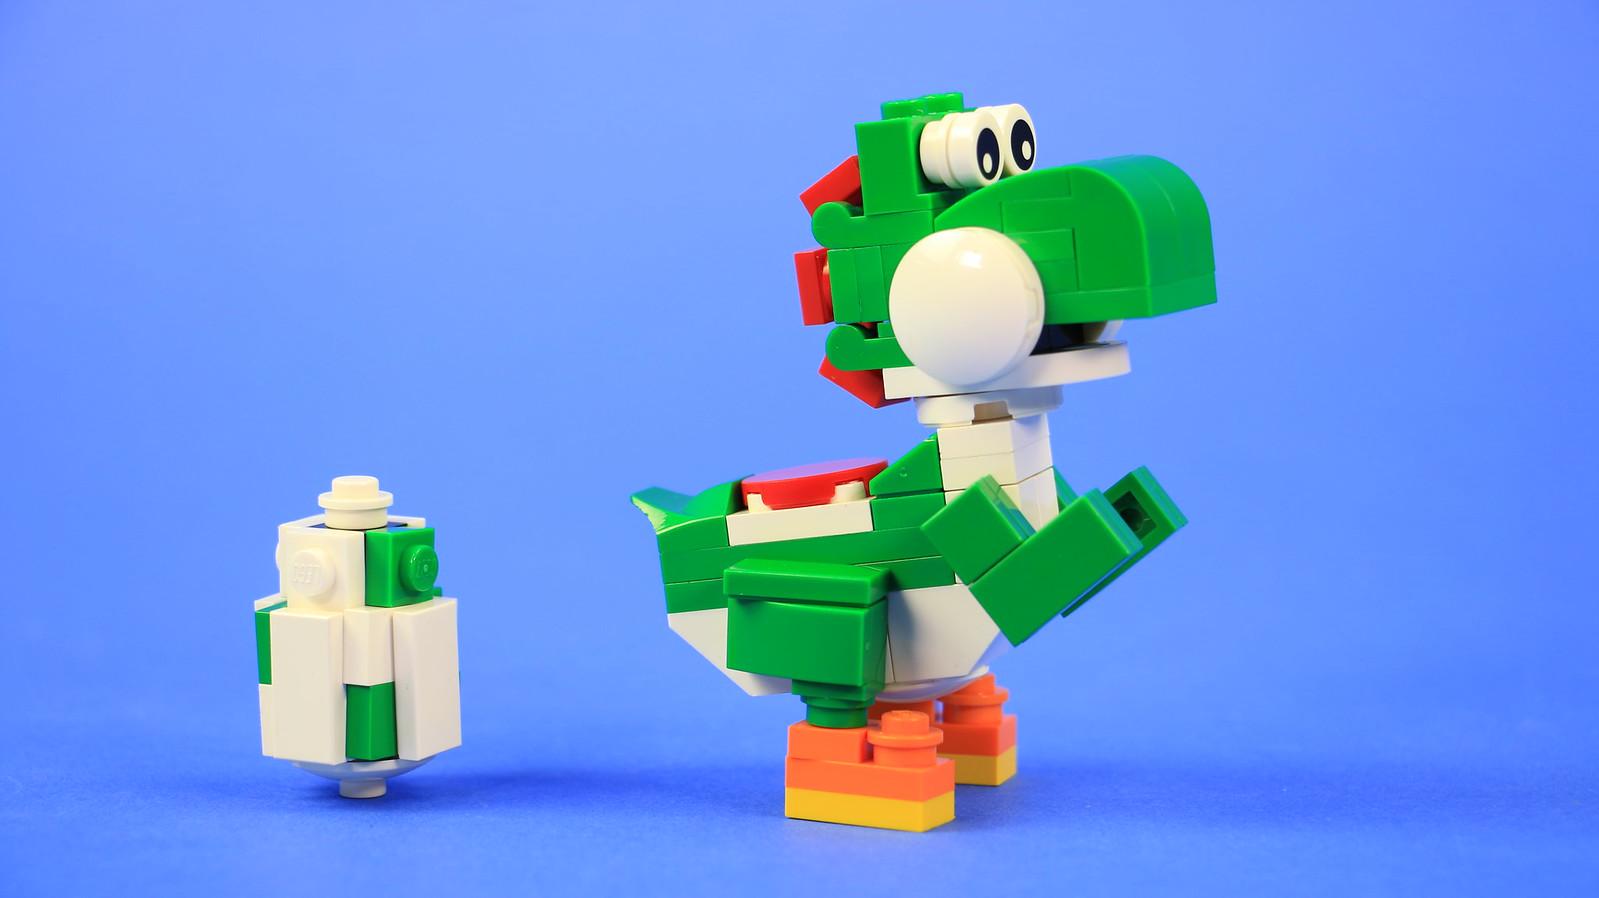 Build Your Own Lego Yoshi Baby Mario Yoshi Eggs Instructions